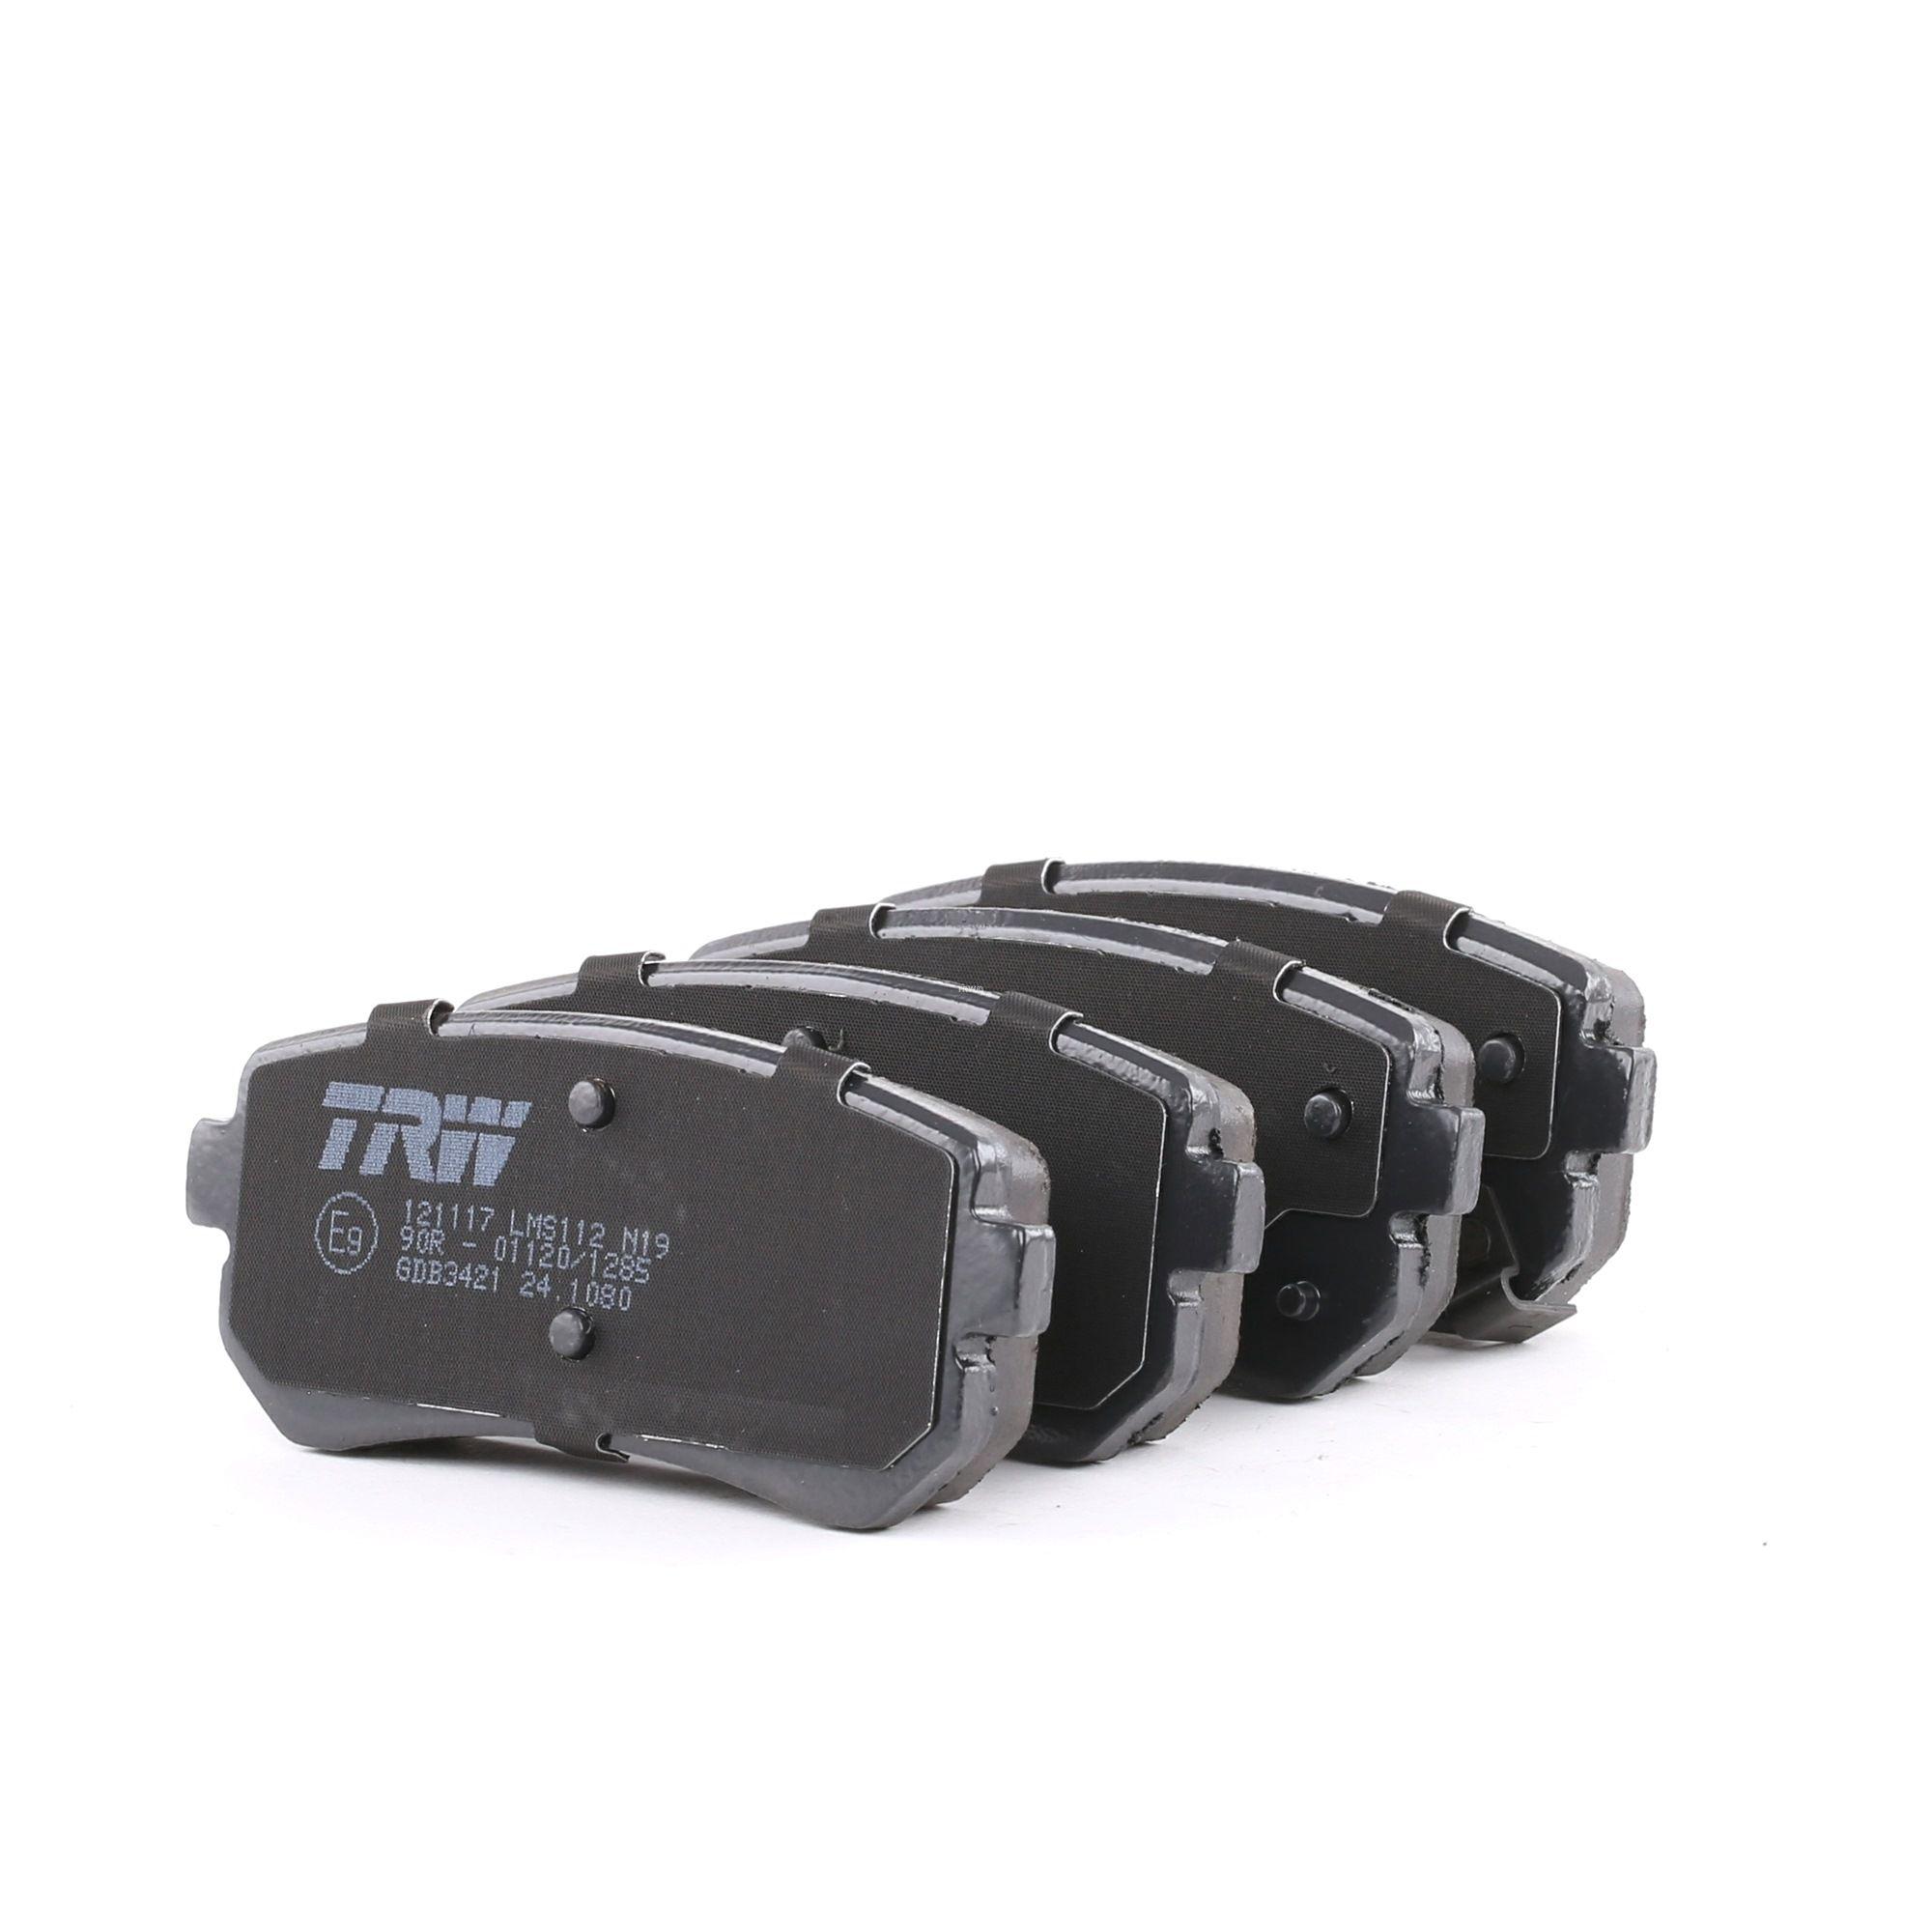 Disk brake pads TRW 24321 rating